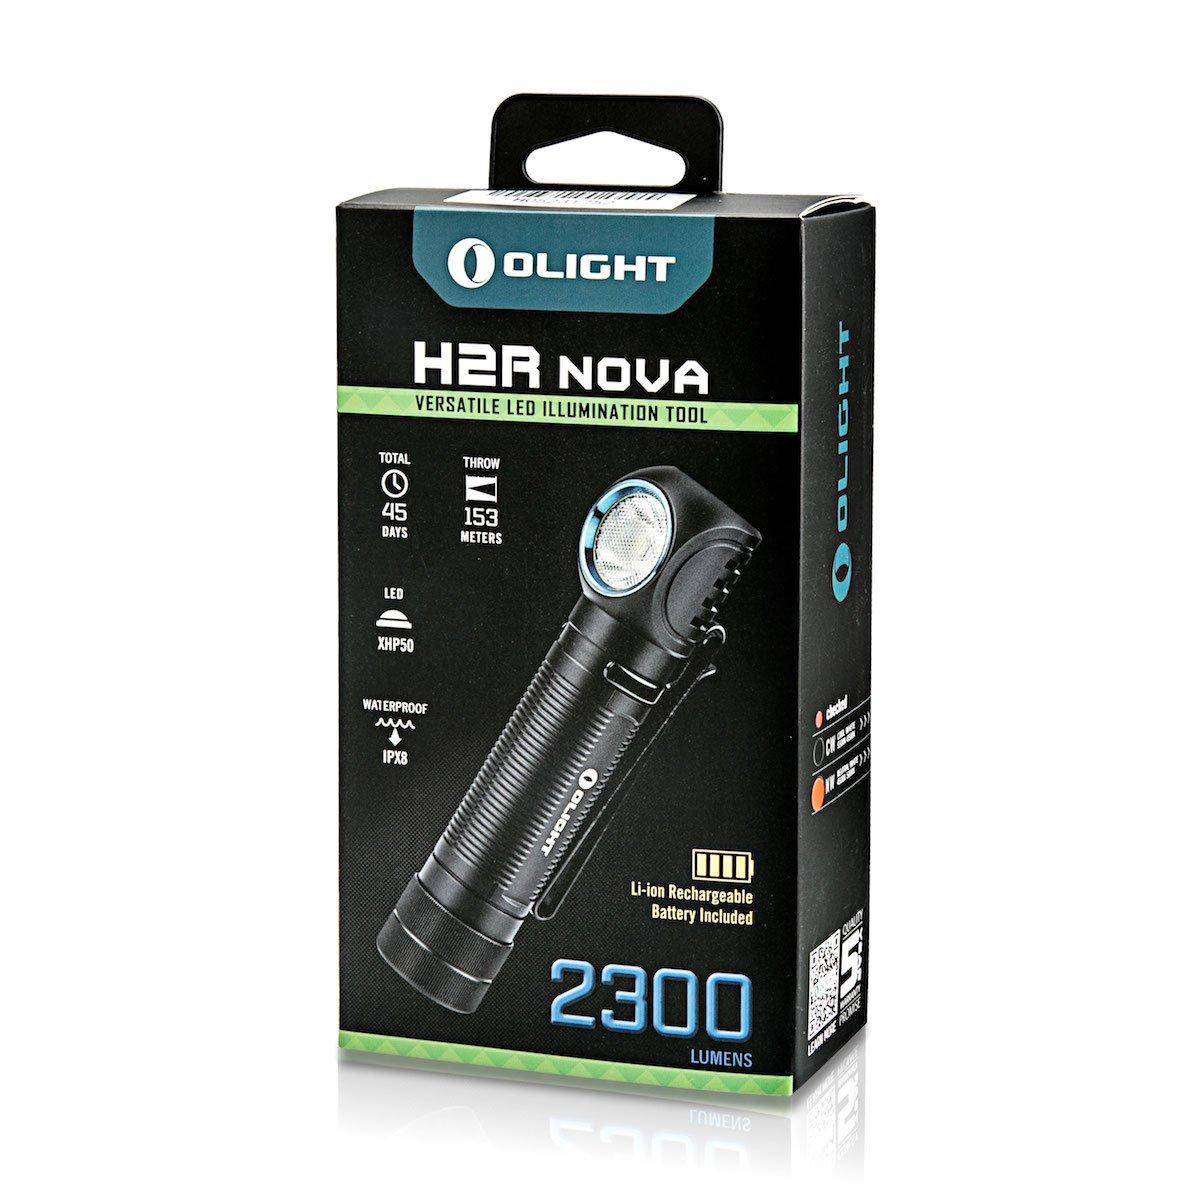 1 /×18650 bater/ía incluida Olight/® H2R Nova linterna frontal recargable,vers/átil con CREE XHP50 LED Blanco neutro , blanco fr/ío